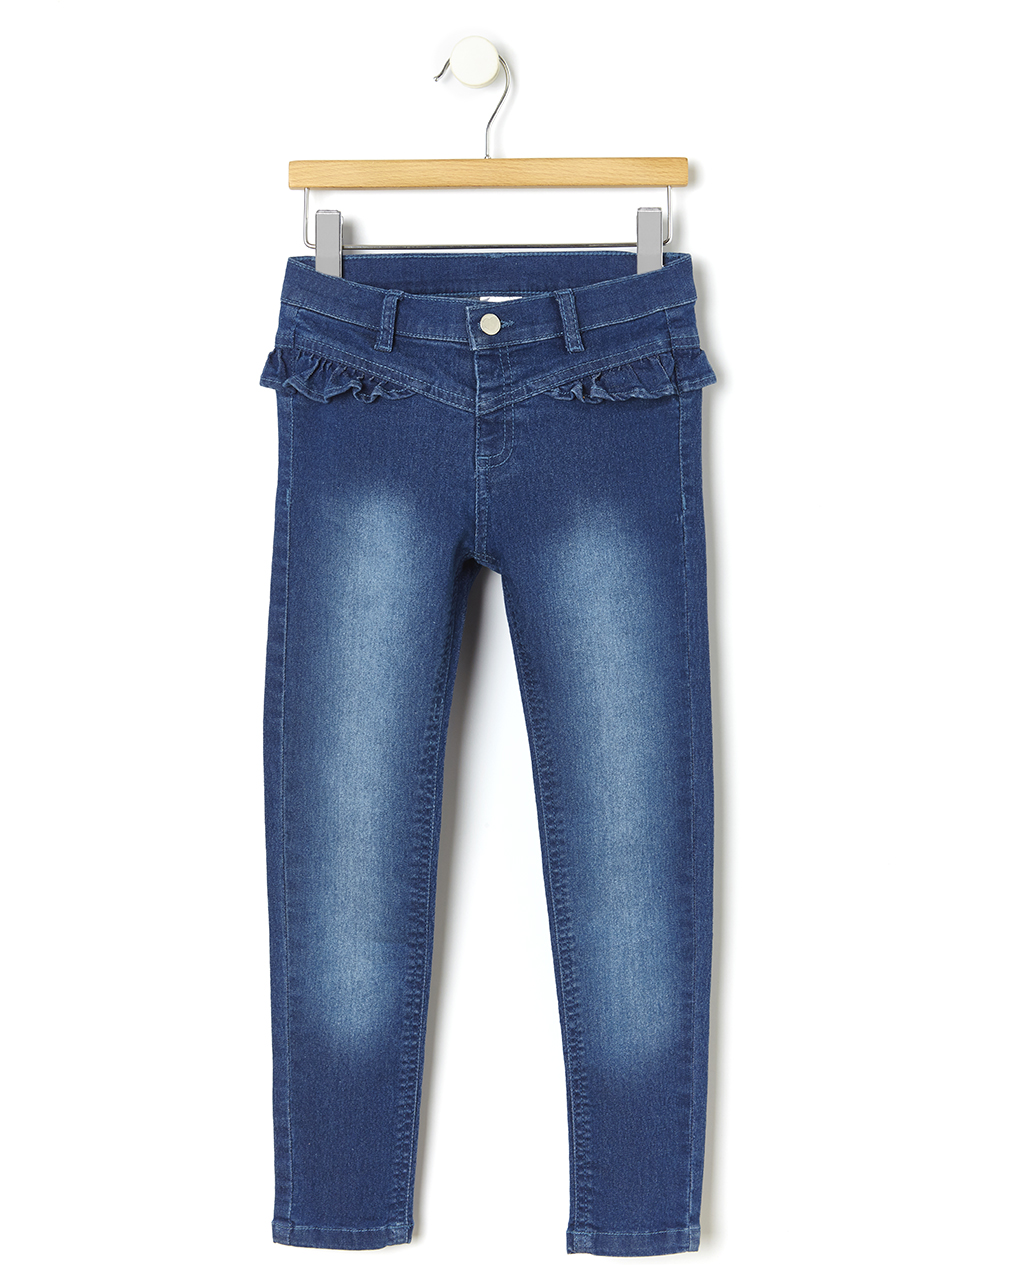 Pantalone denim con rouches - Prénatal